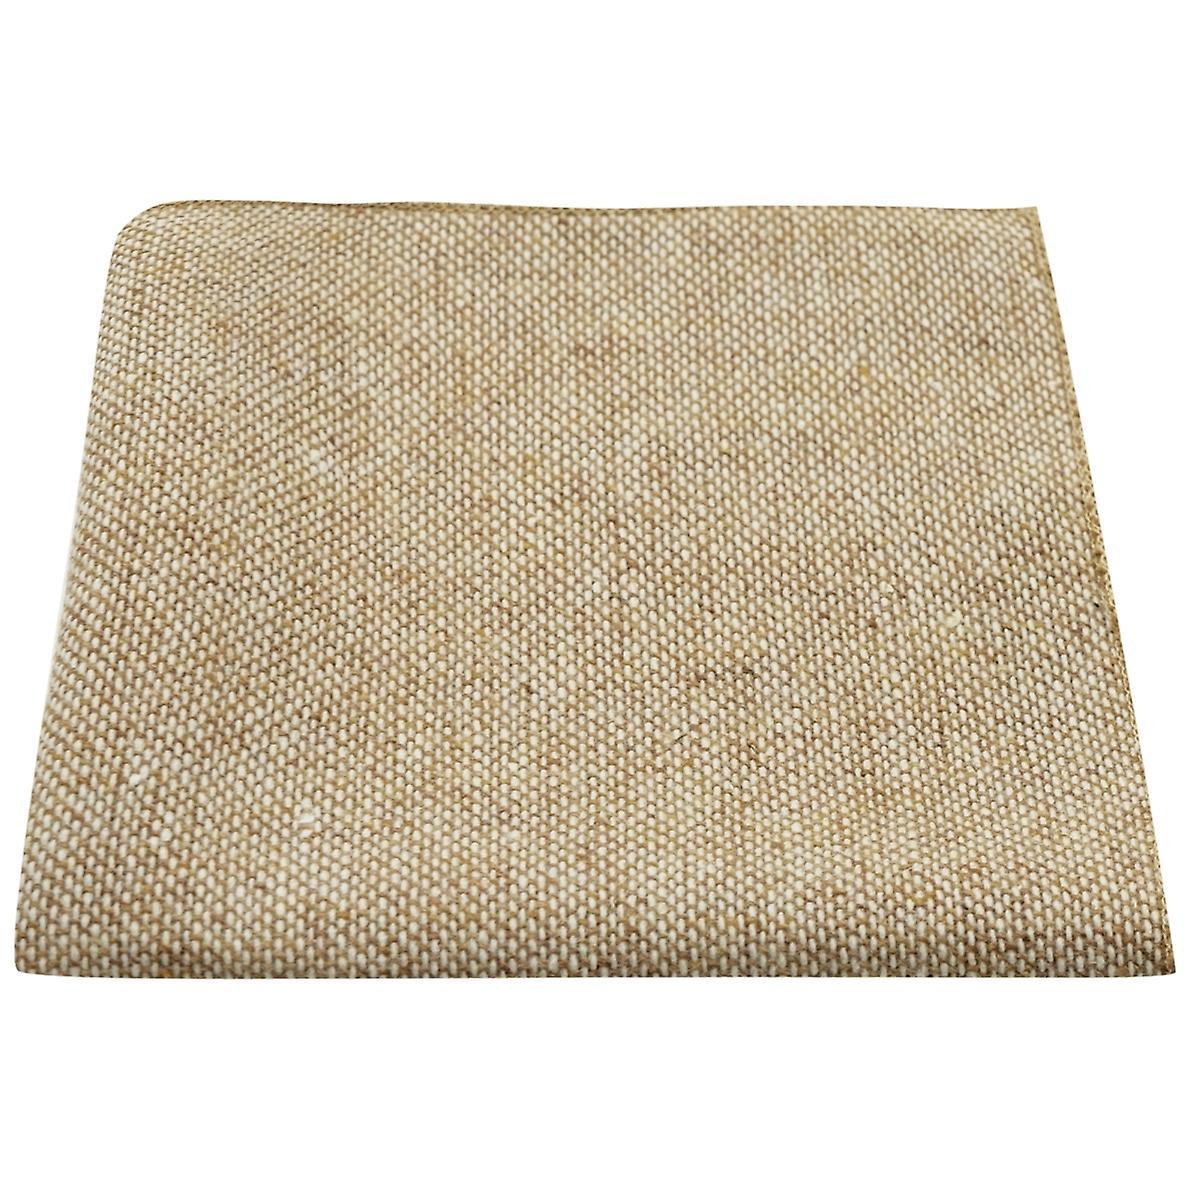 Highland Weave Stonewashed Light Brown Pocket Square, Handkerchief